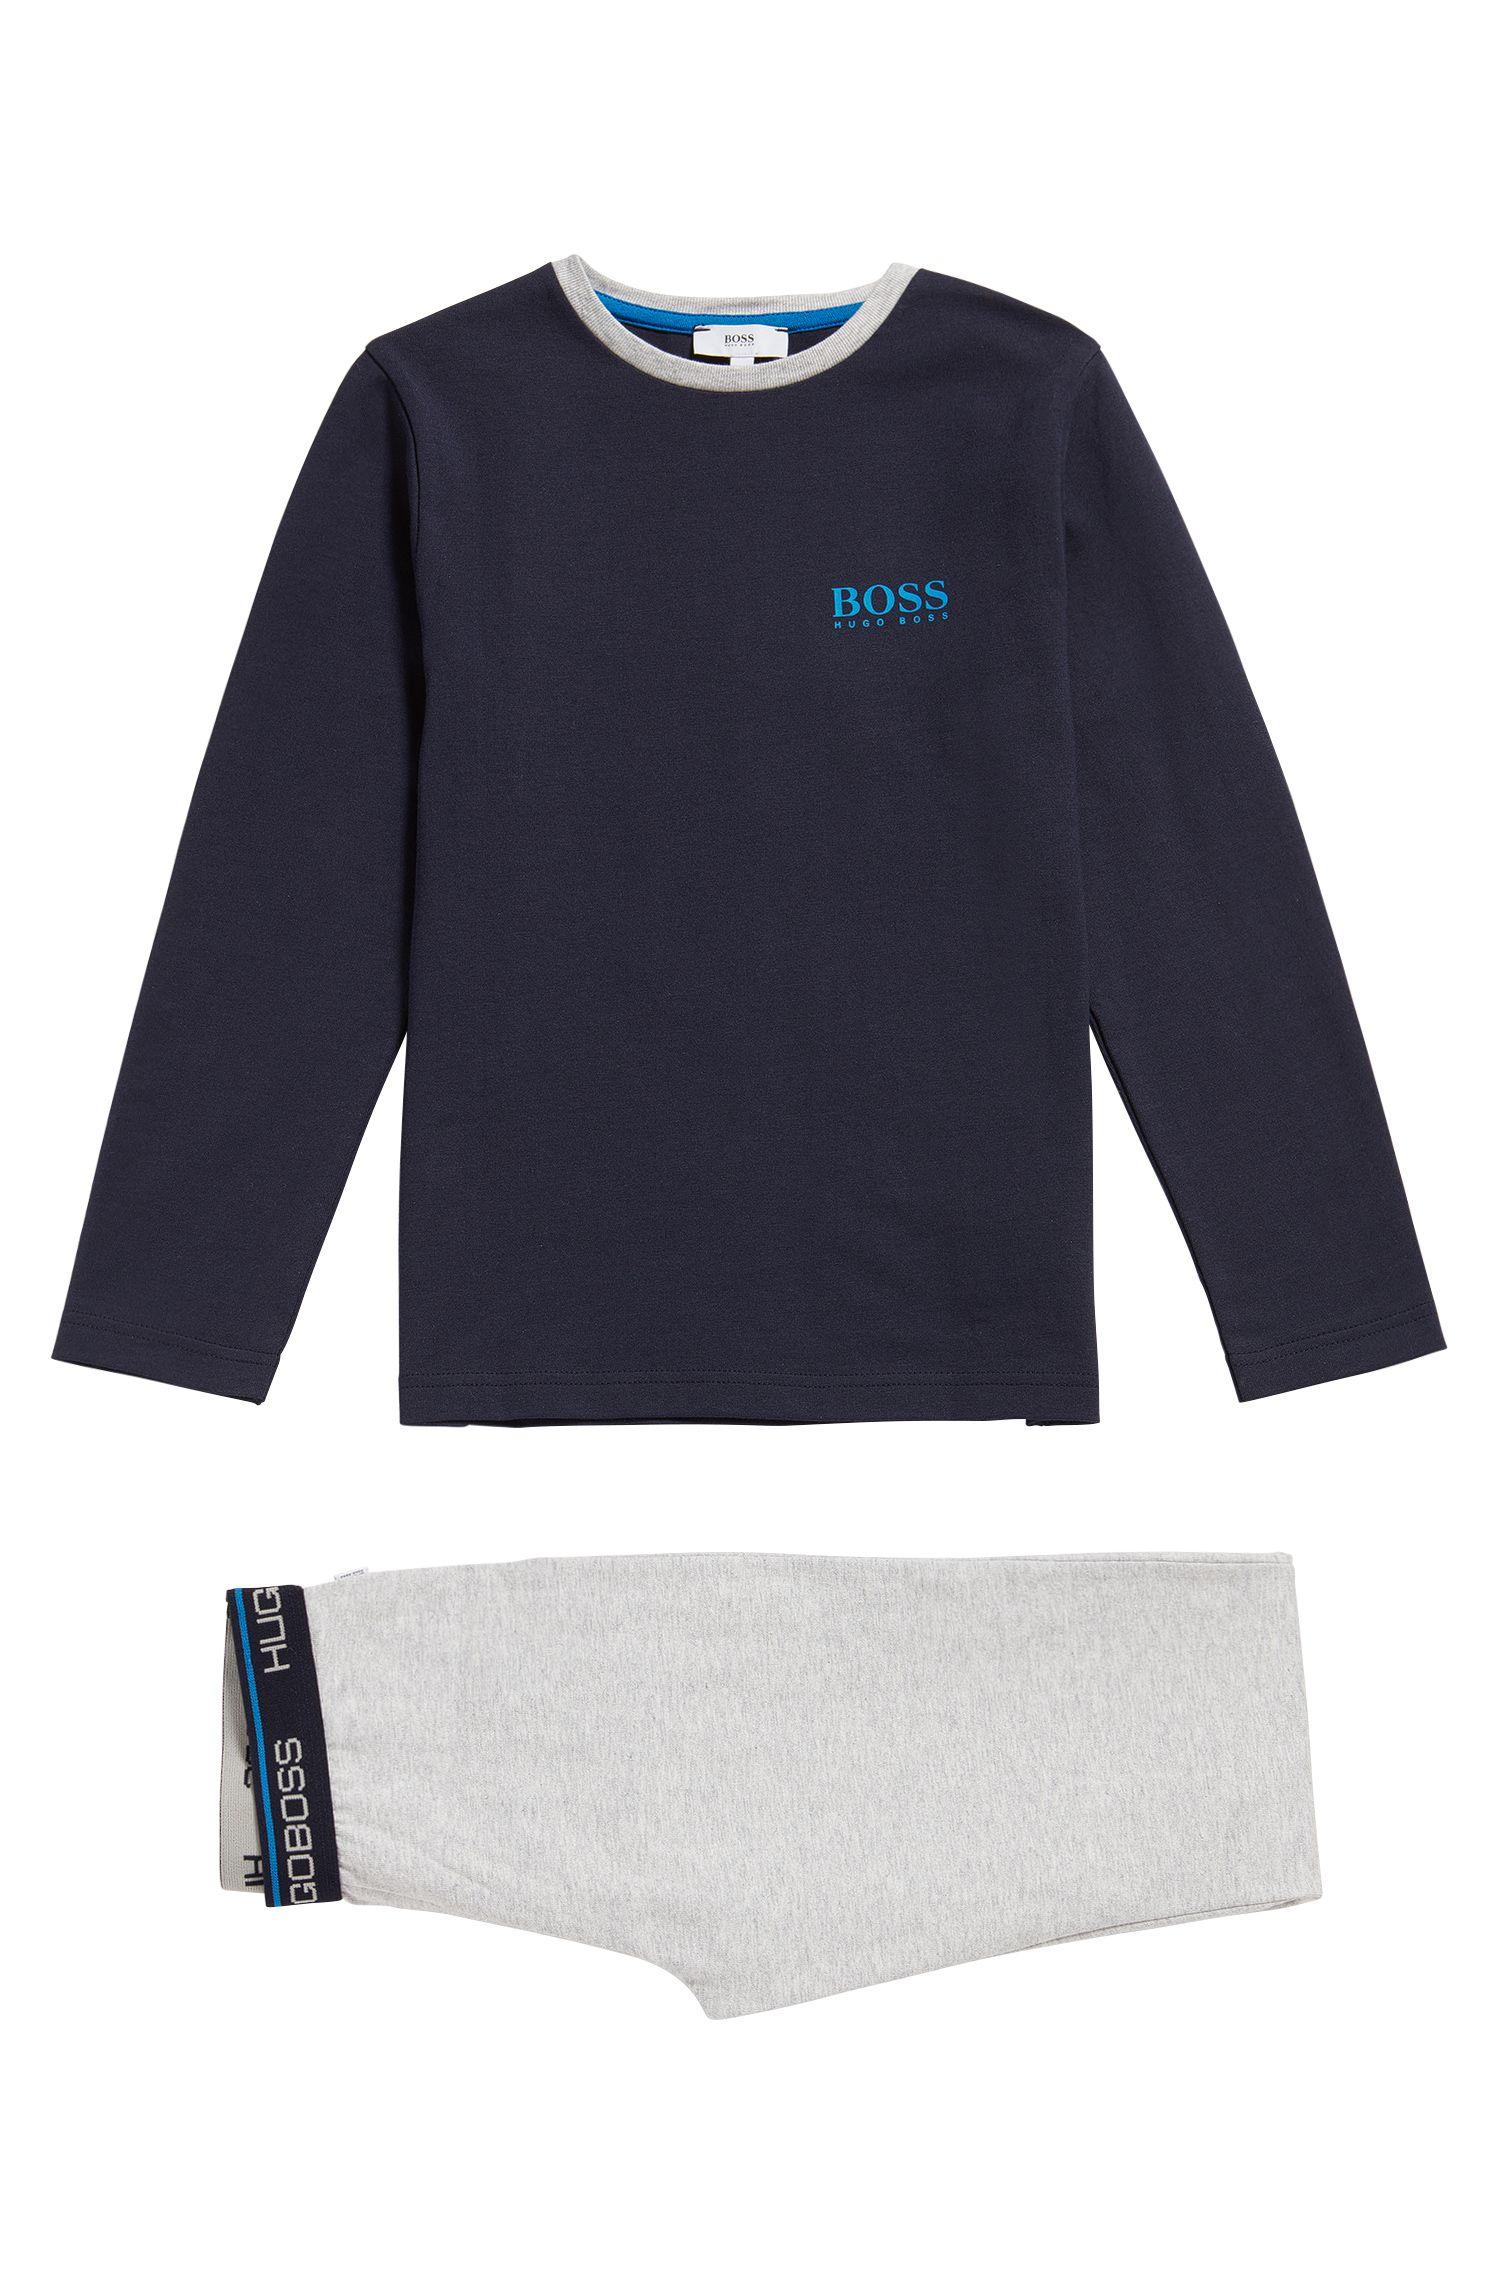 Kinderpyjama van katoen met logoprint: 'J28048'